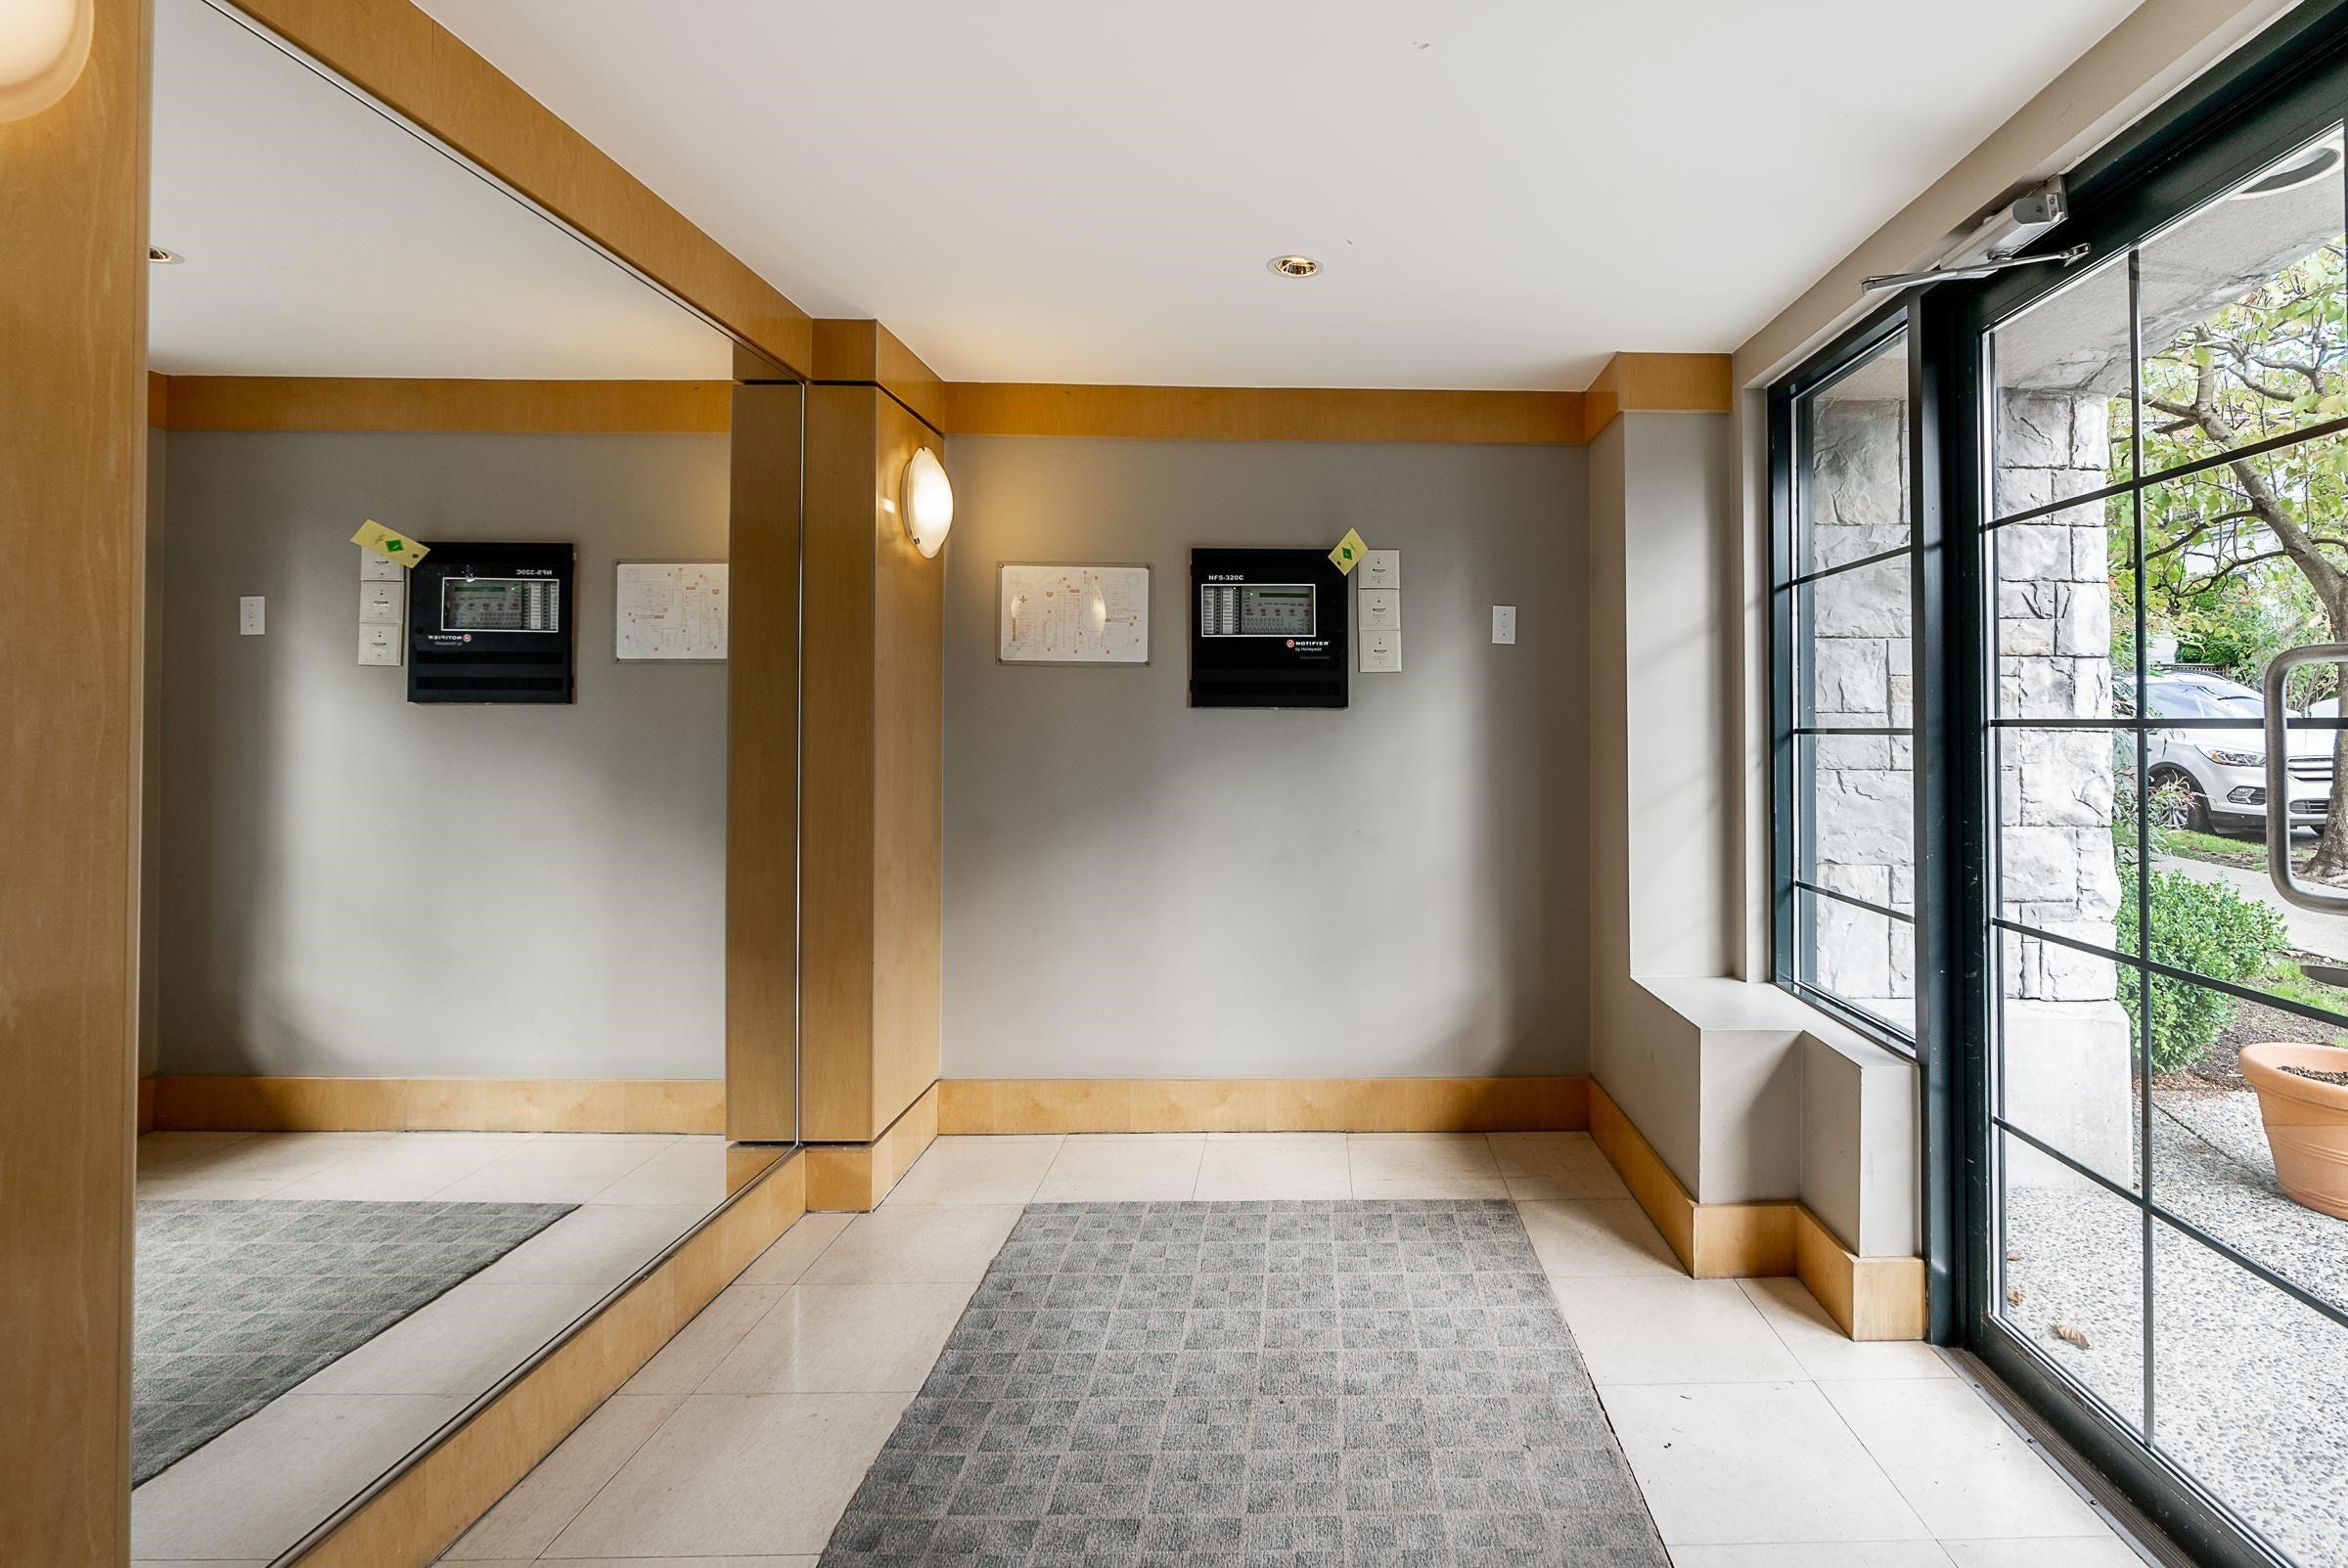 406 1989 DUNBAR STREET - Kitsilano Apartment/Condo for sale, 1 Bedroom (R2624949) - #22